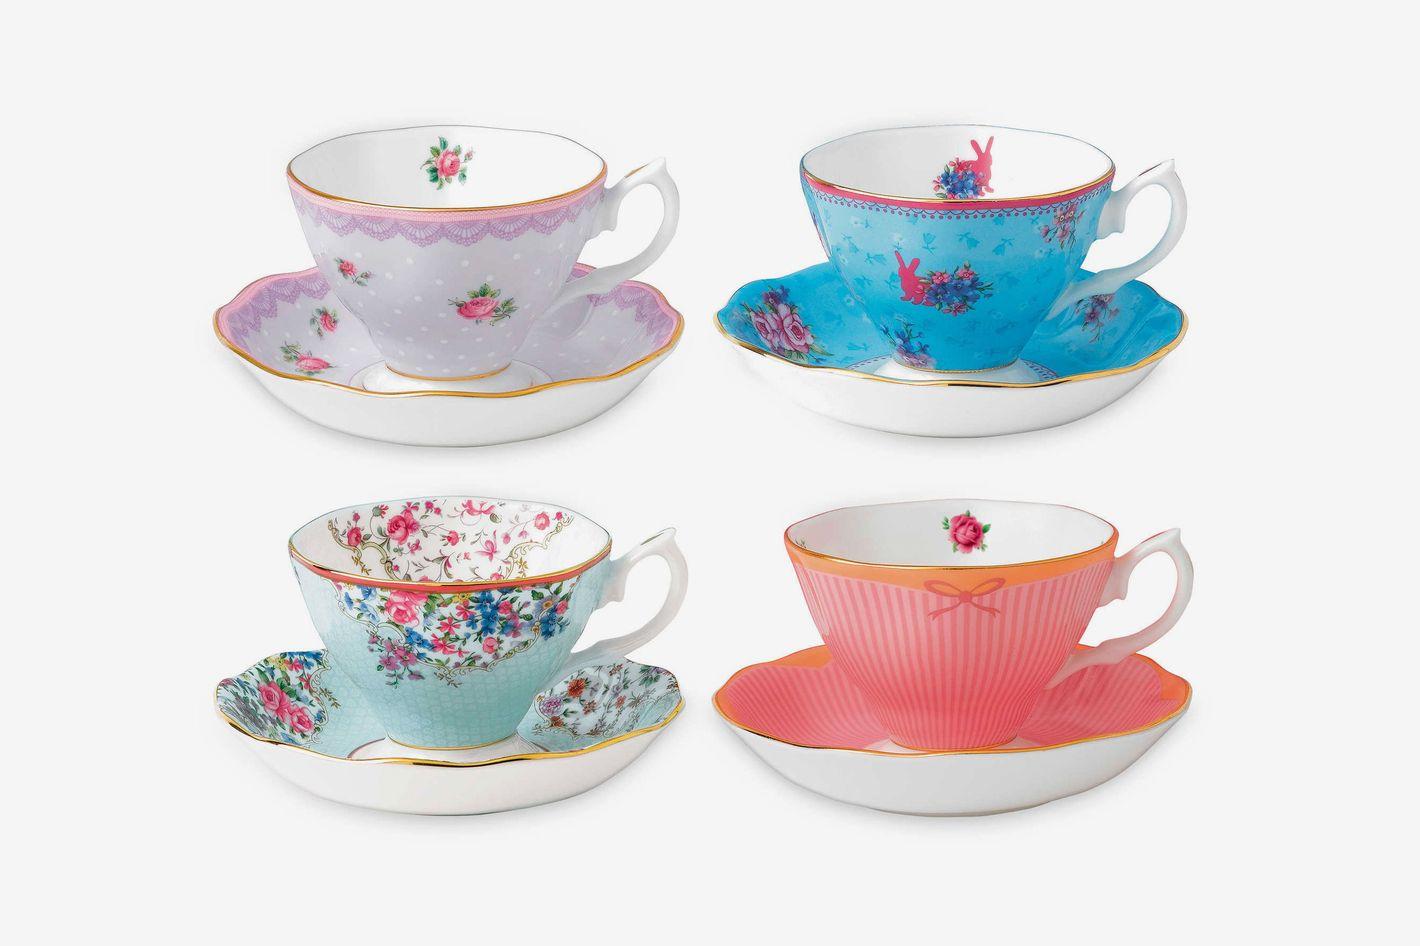 Royal Albert Candy Teacups and Saucers, (Set of 4)